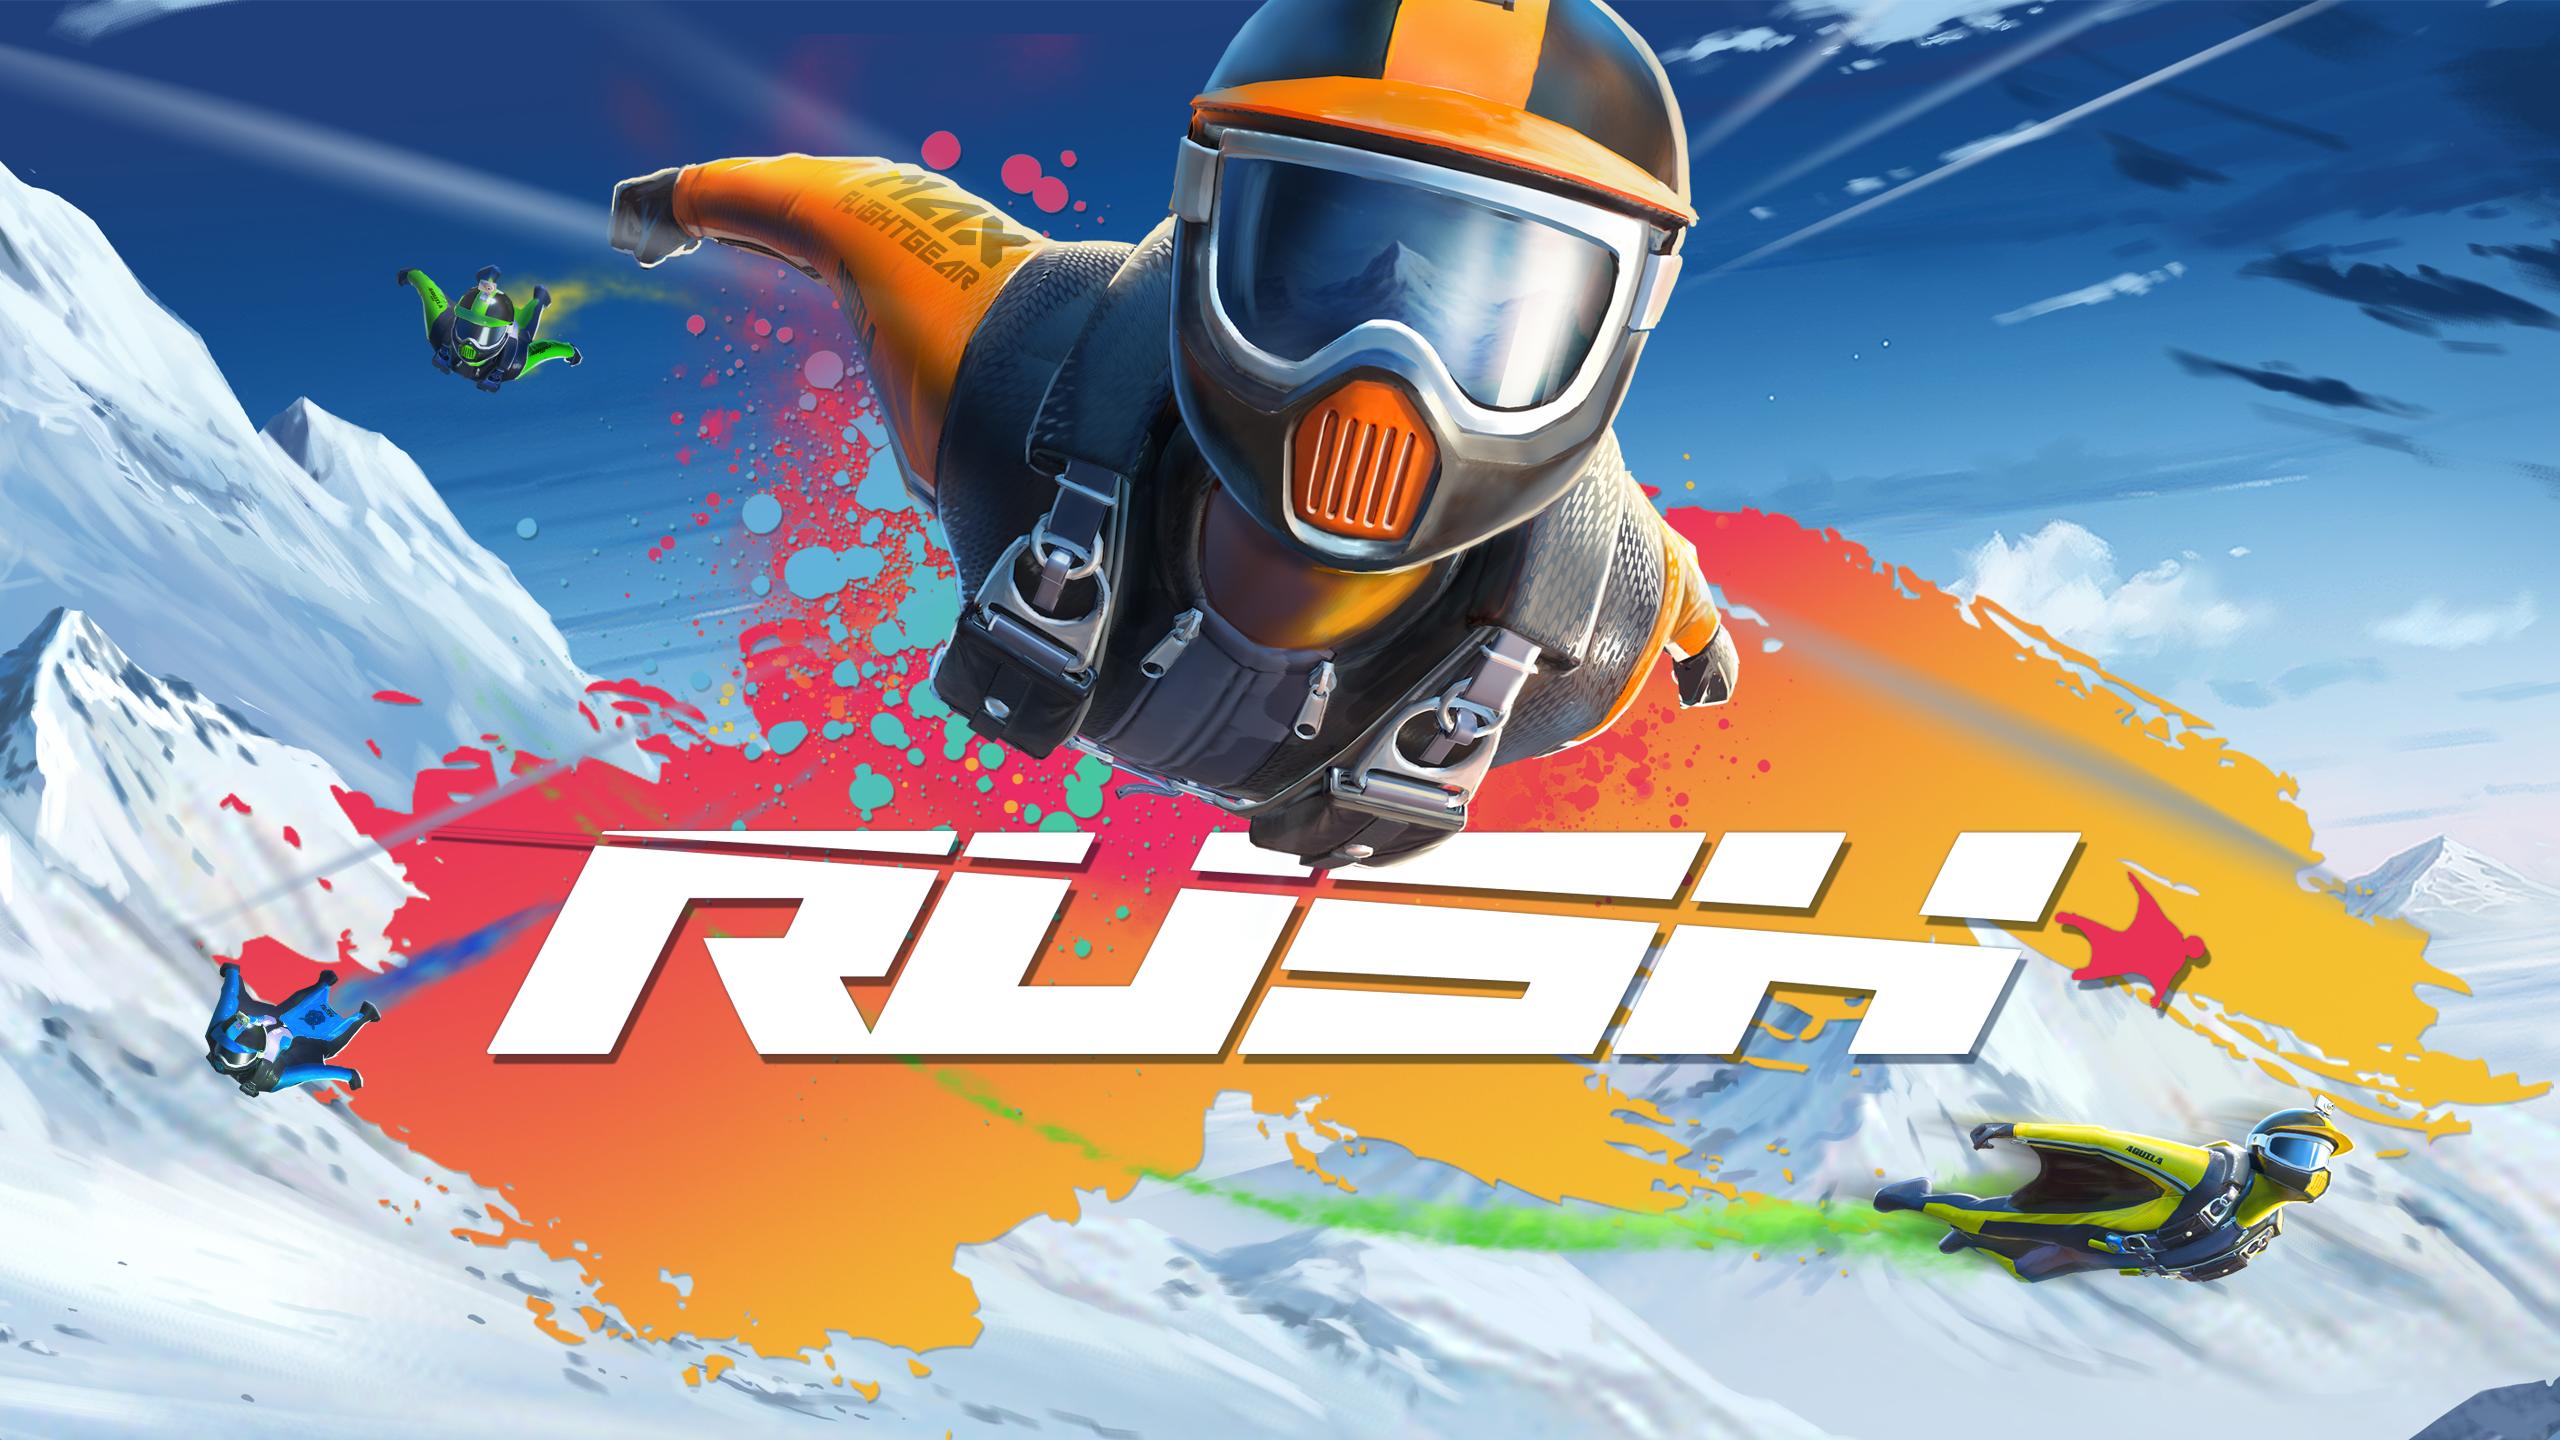 RUSH - Gear VR